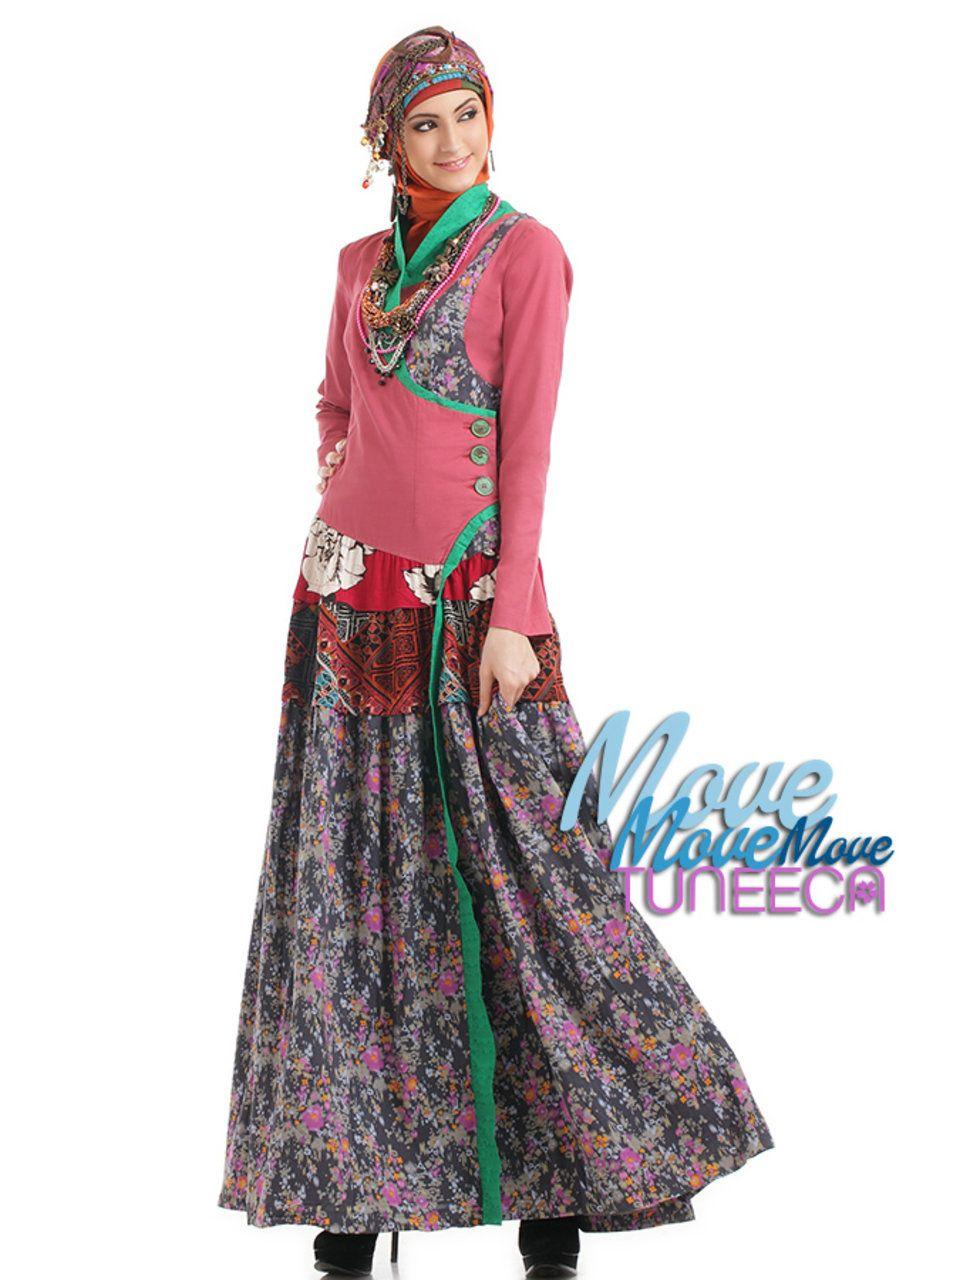 Tuneeca Muslim Fashion Hobby Fashion Pinterest Muslim